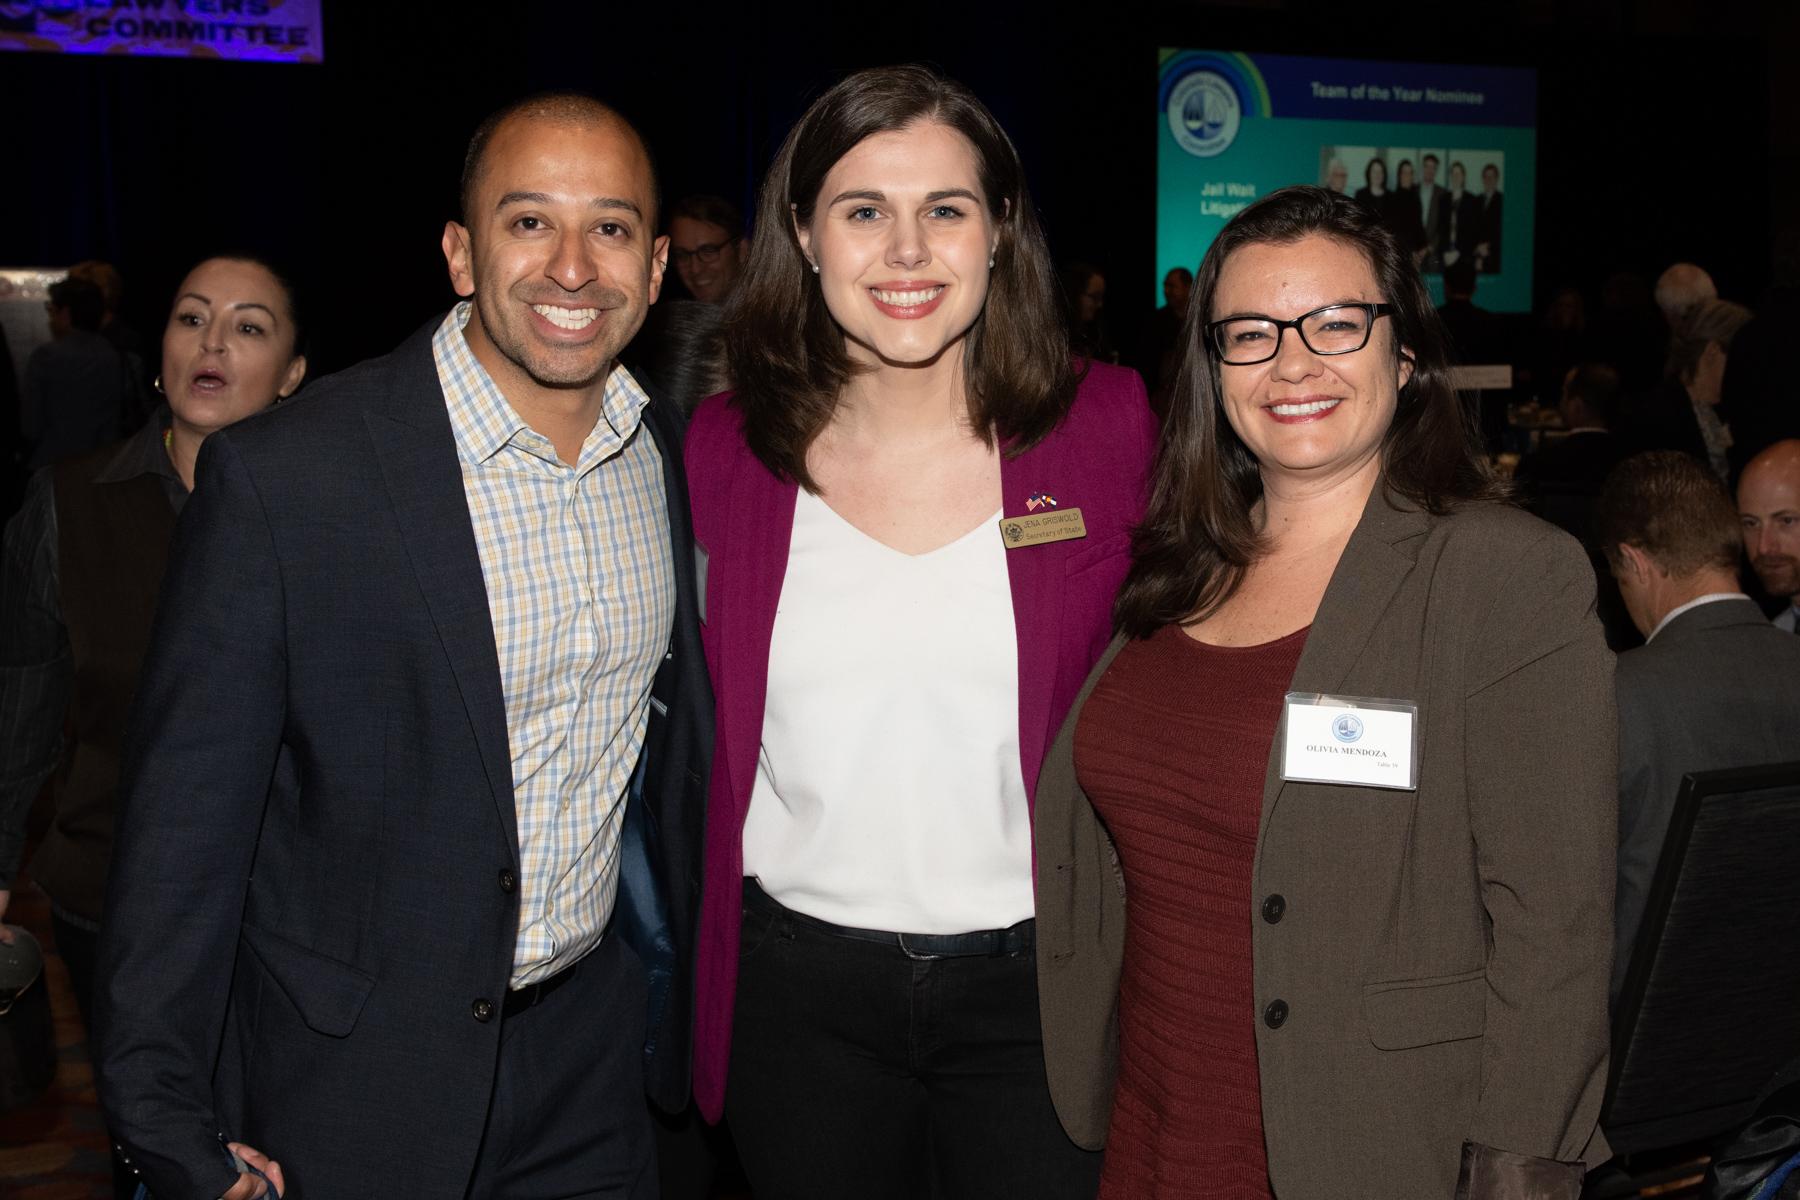 _DSC7215 Daniel Ramos, Jena Griswold & Olivia Mendoza (courtesy of Hartmannphoto).jpg